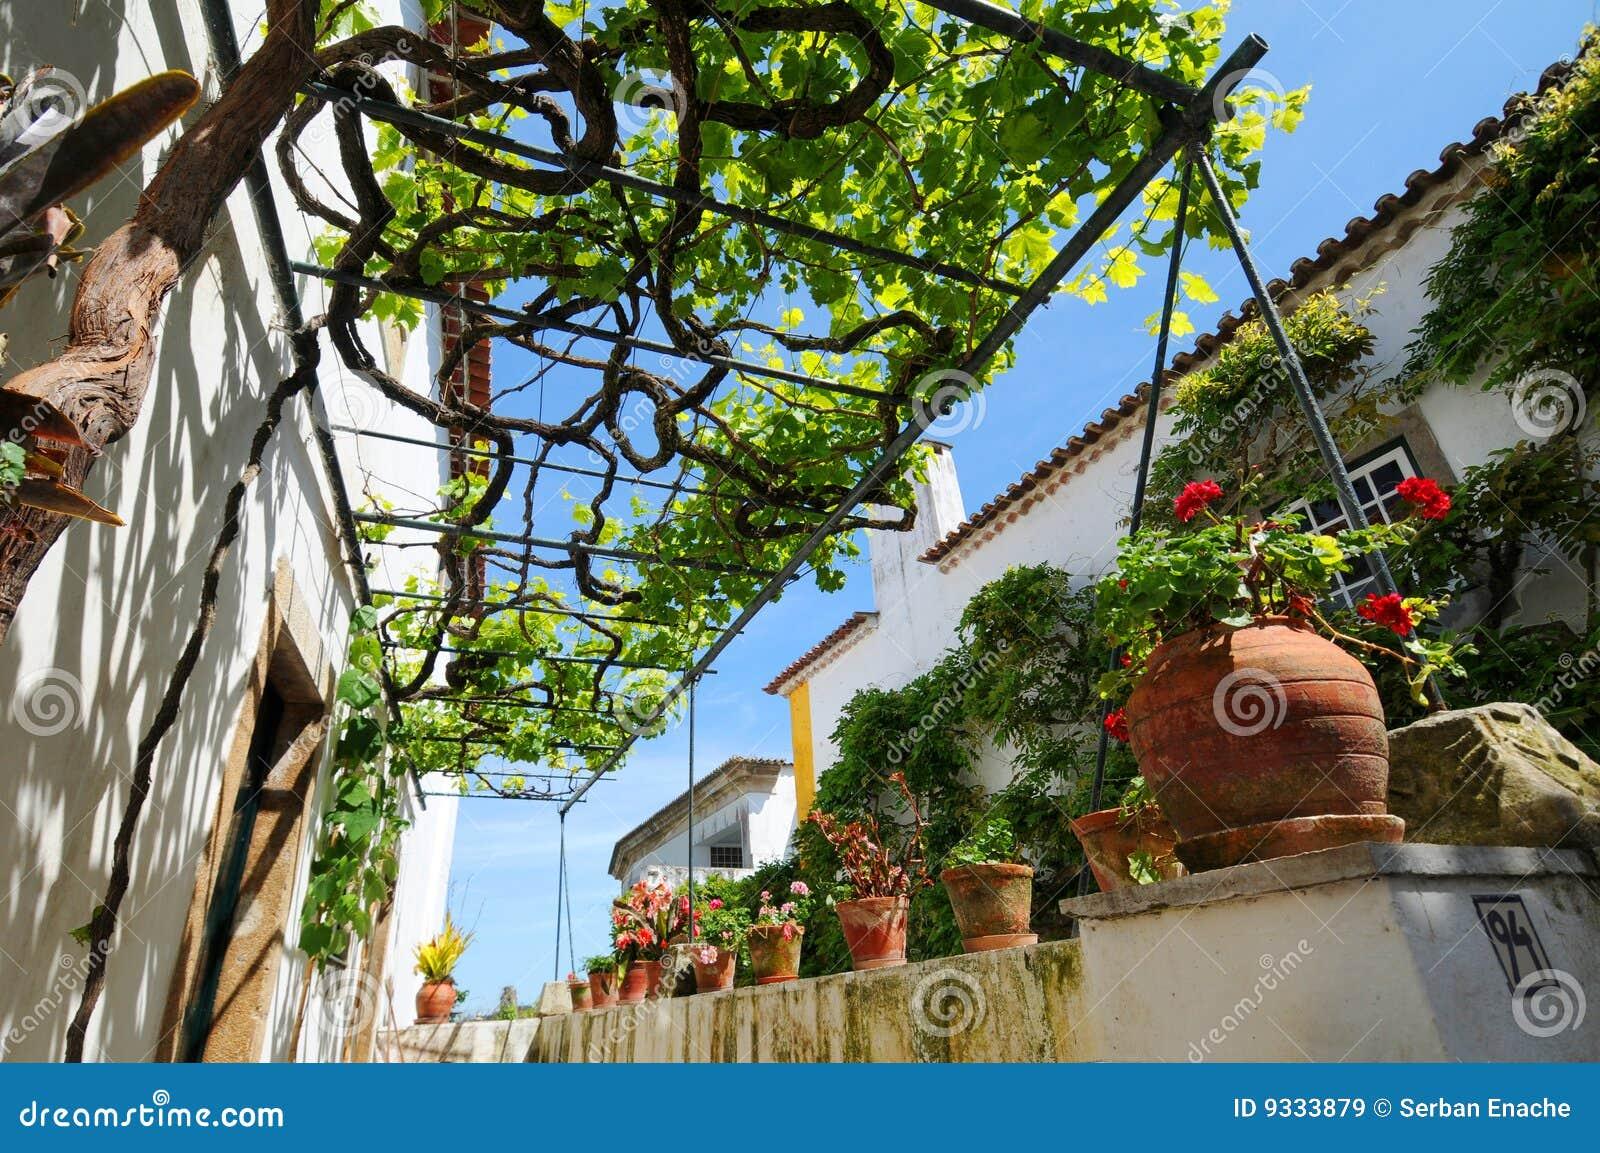 pergola et vigne image stock image du fleuri structures 9333879. Black Bedroom Furniture Sets. Home Design Ideas